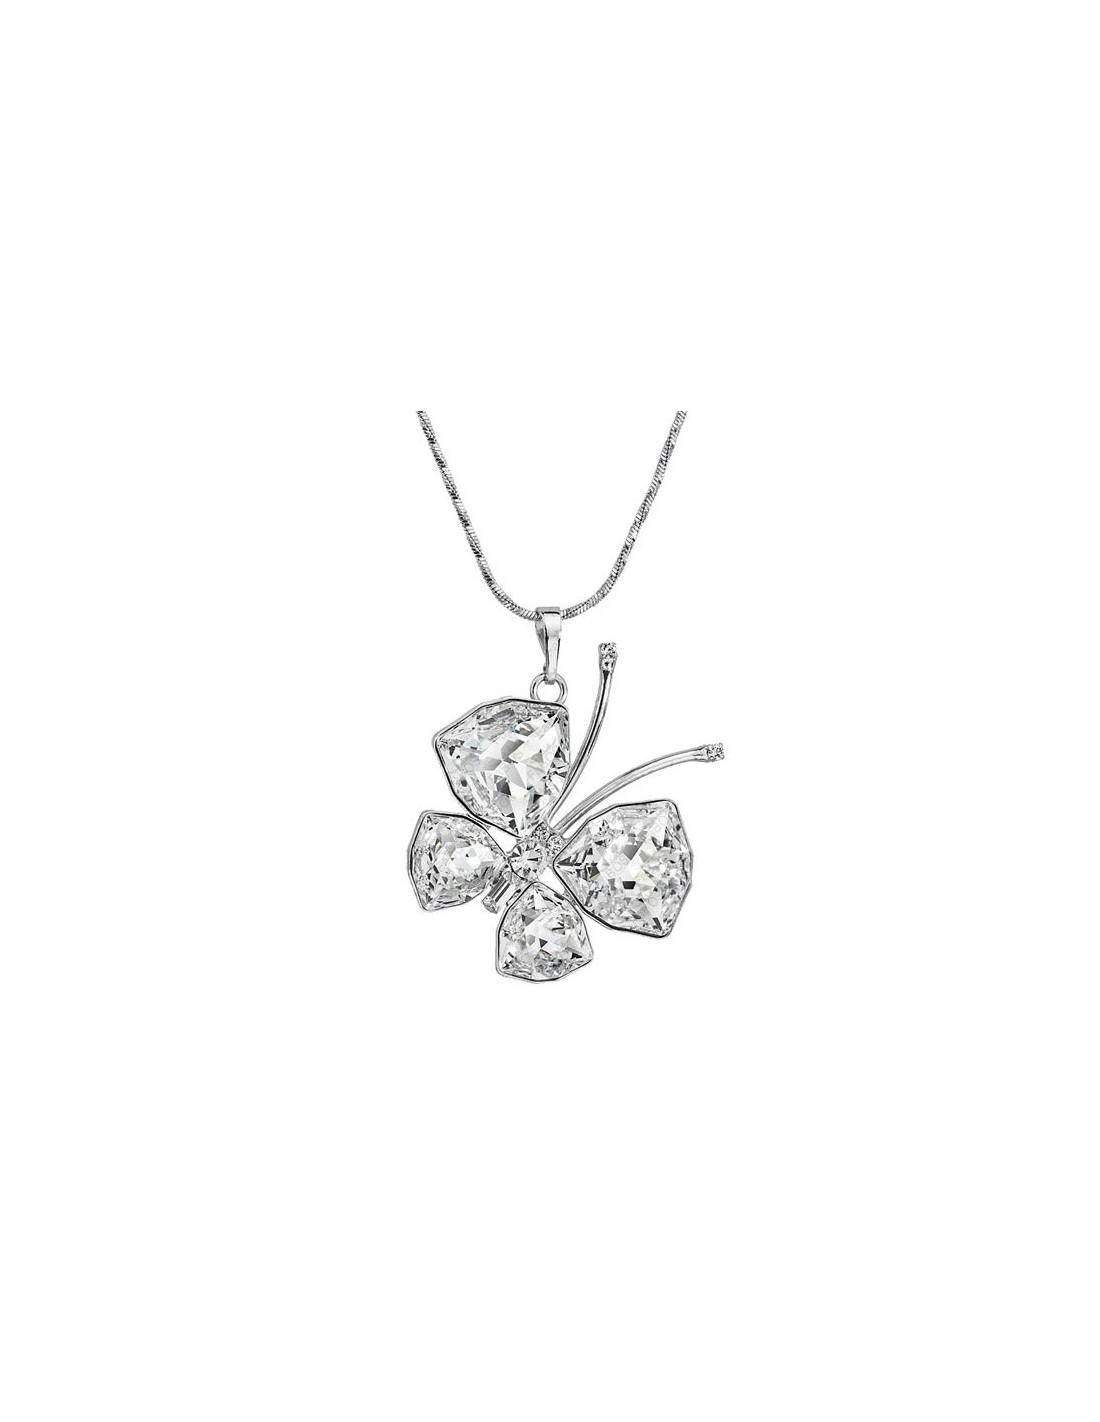 Superbe collier papillon - Swarovski